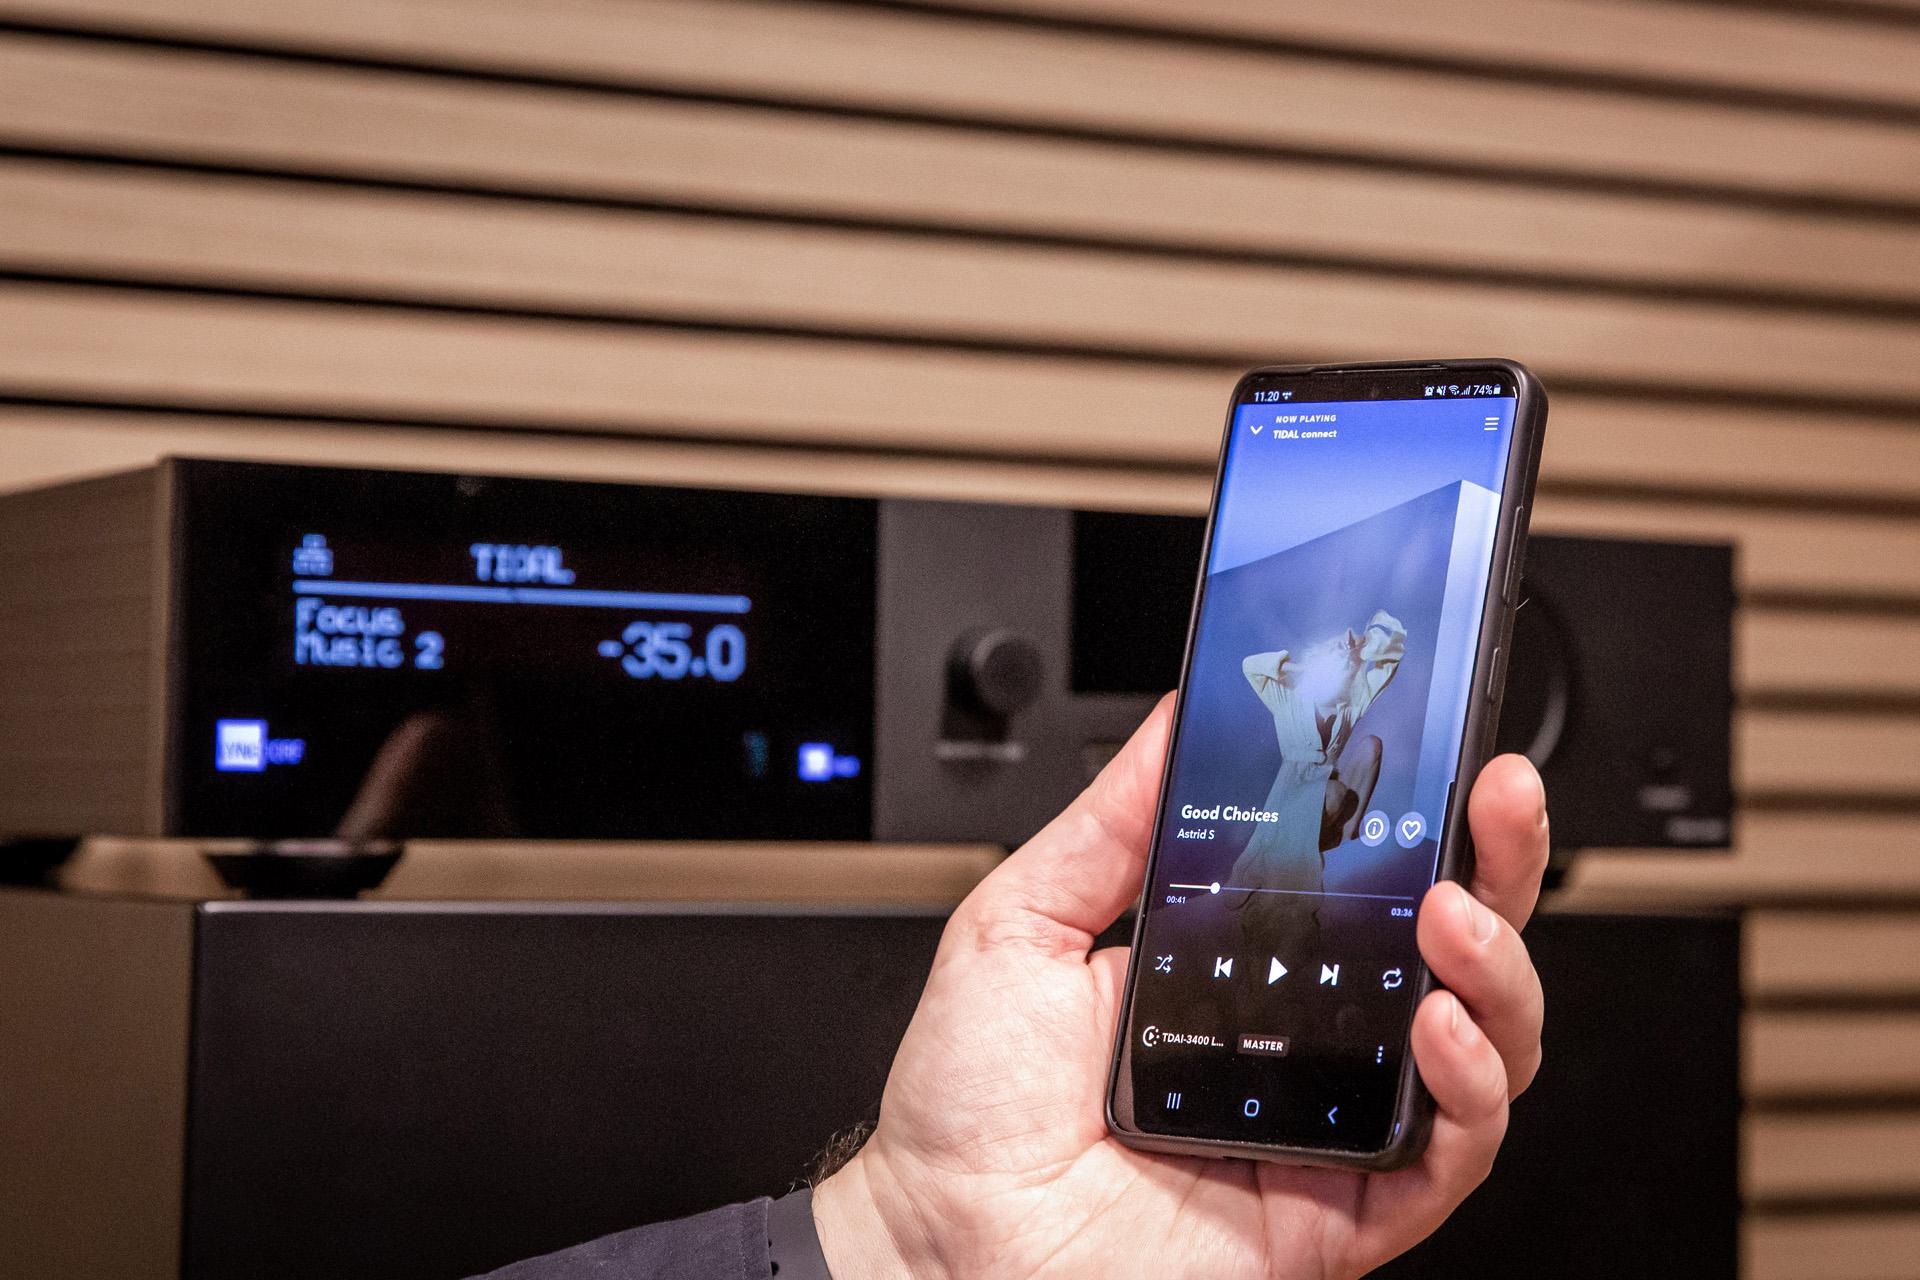 TIDAL-CONNECT-Lyngdorf-Audio hires hi-res streaming strømming høyoppløst